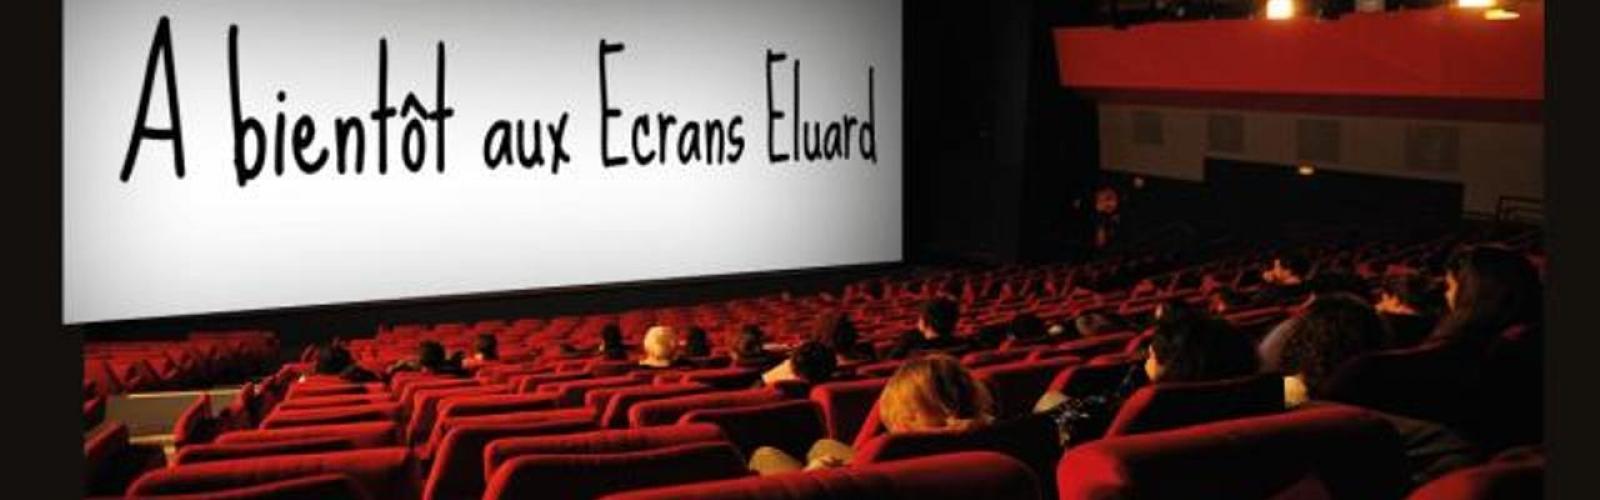 Ecrans Eluard, Bezons